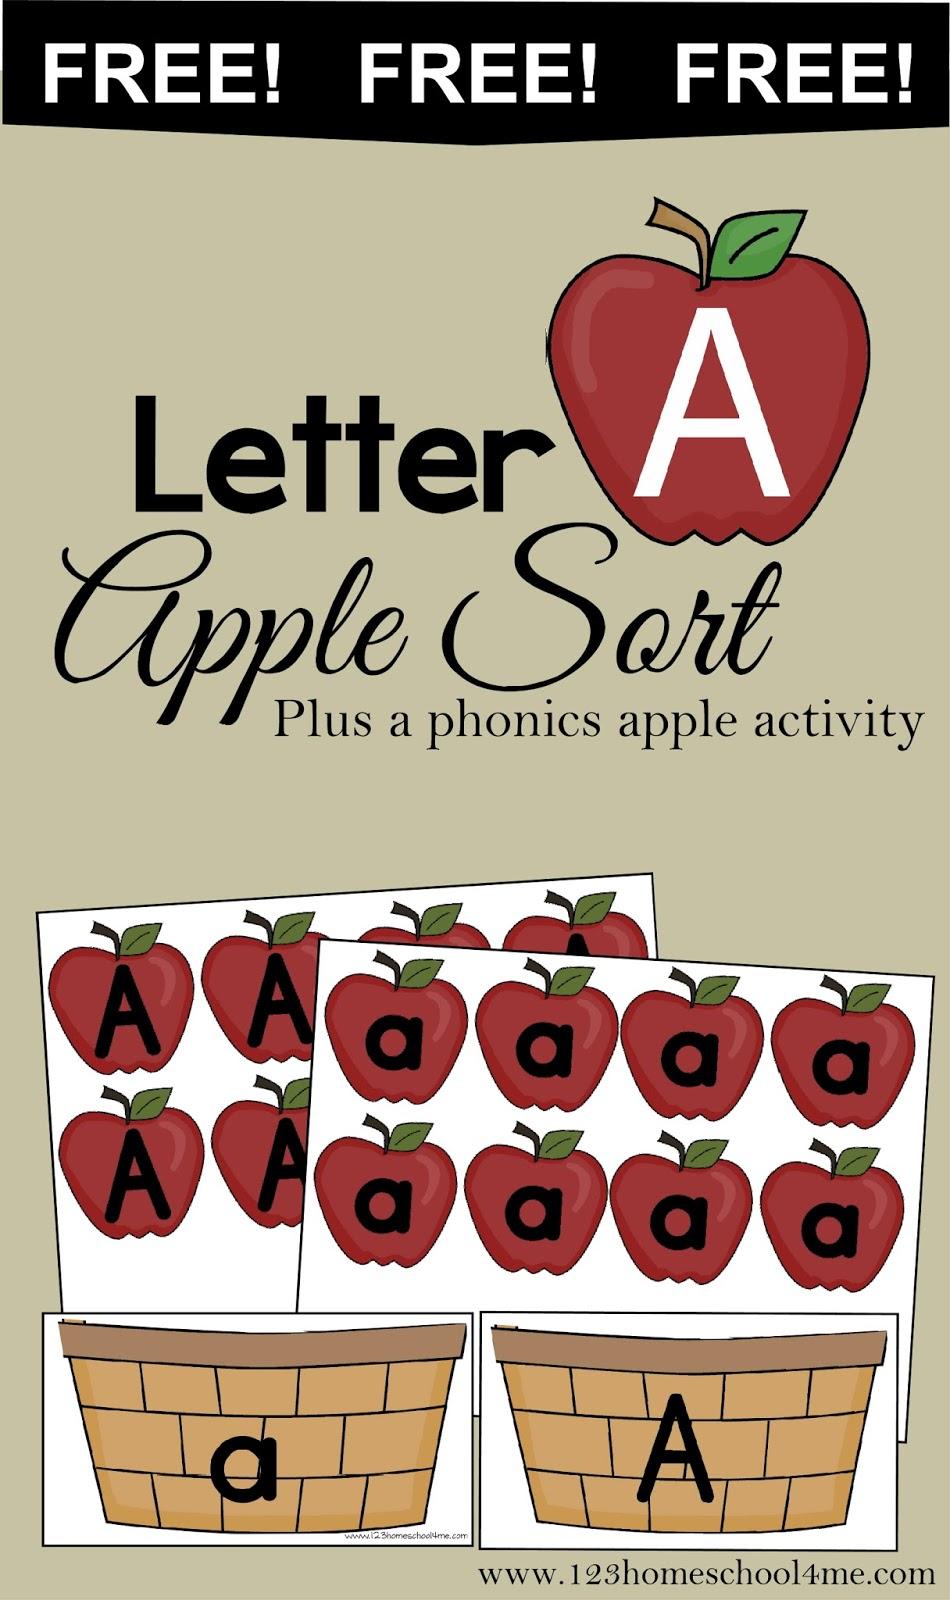 FREE LETTER A APPLE SORT (Instant Download)